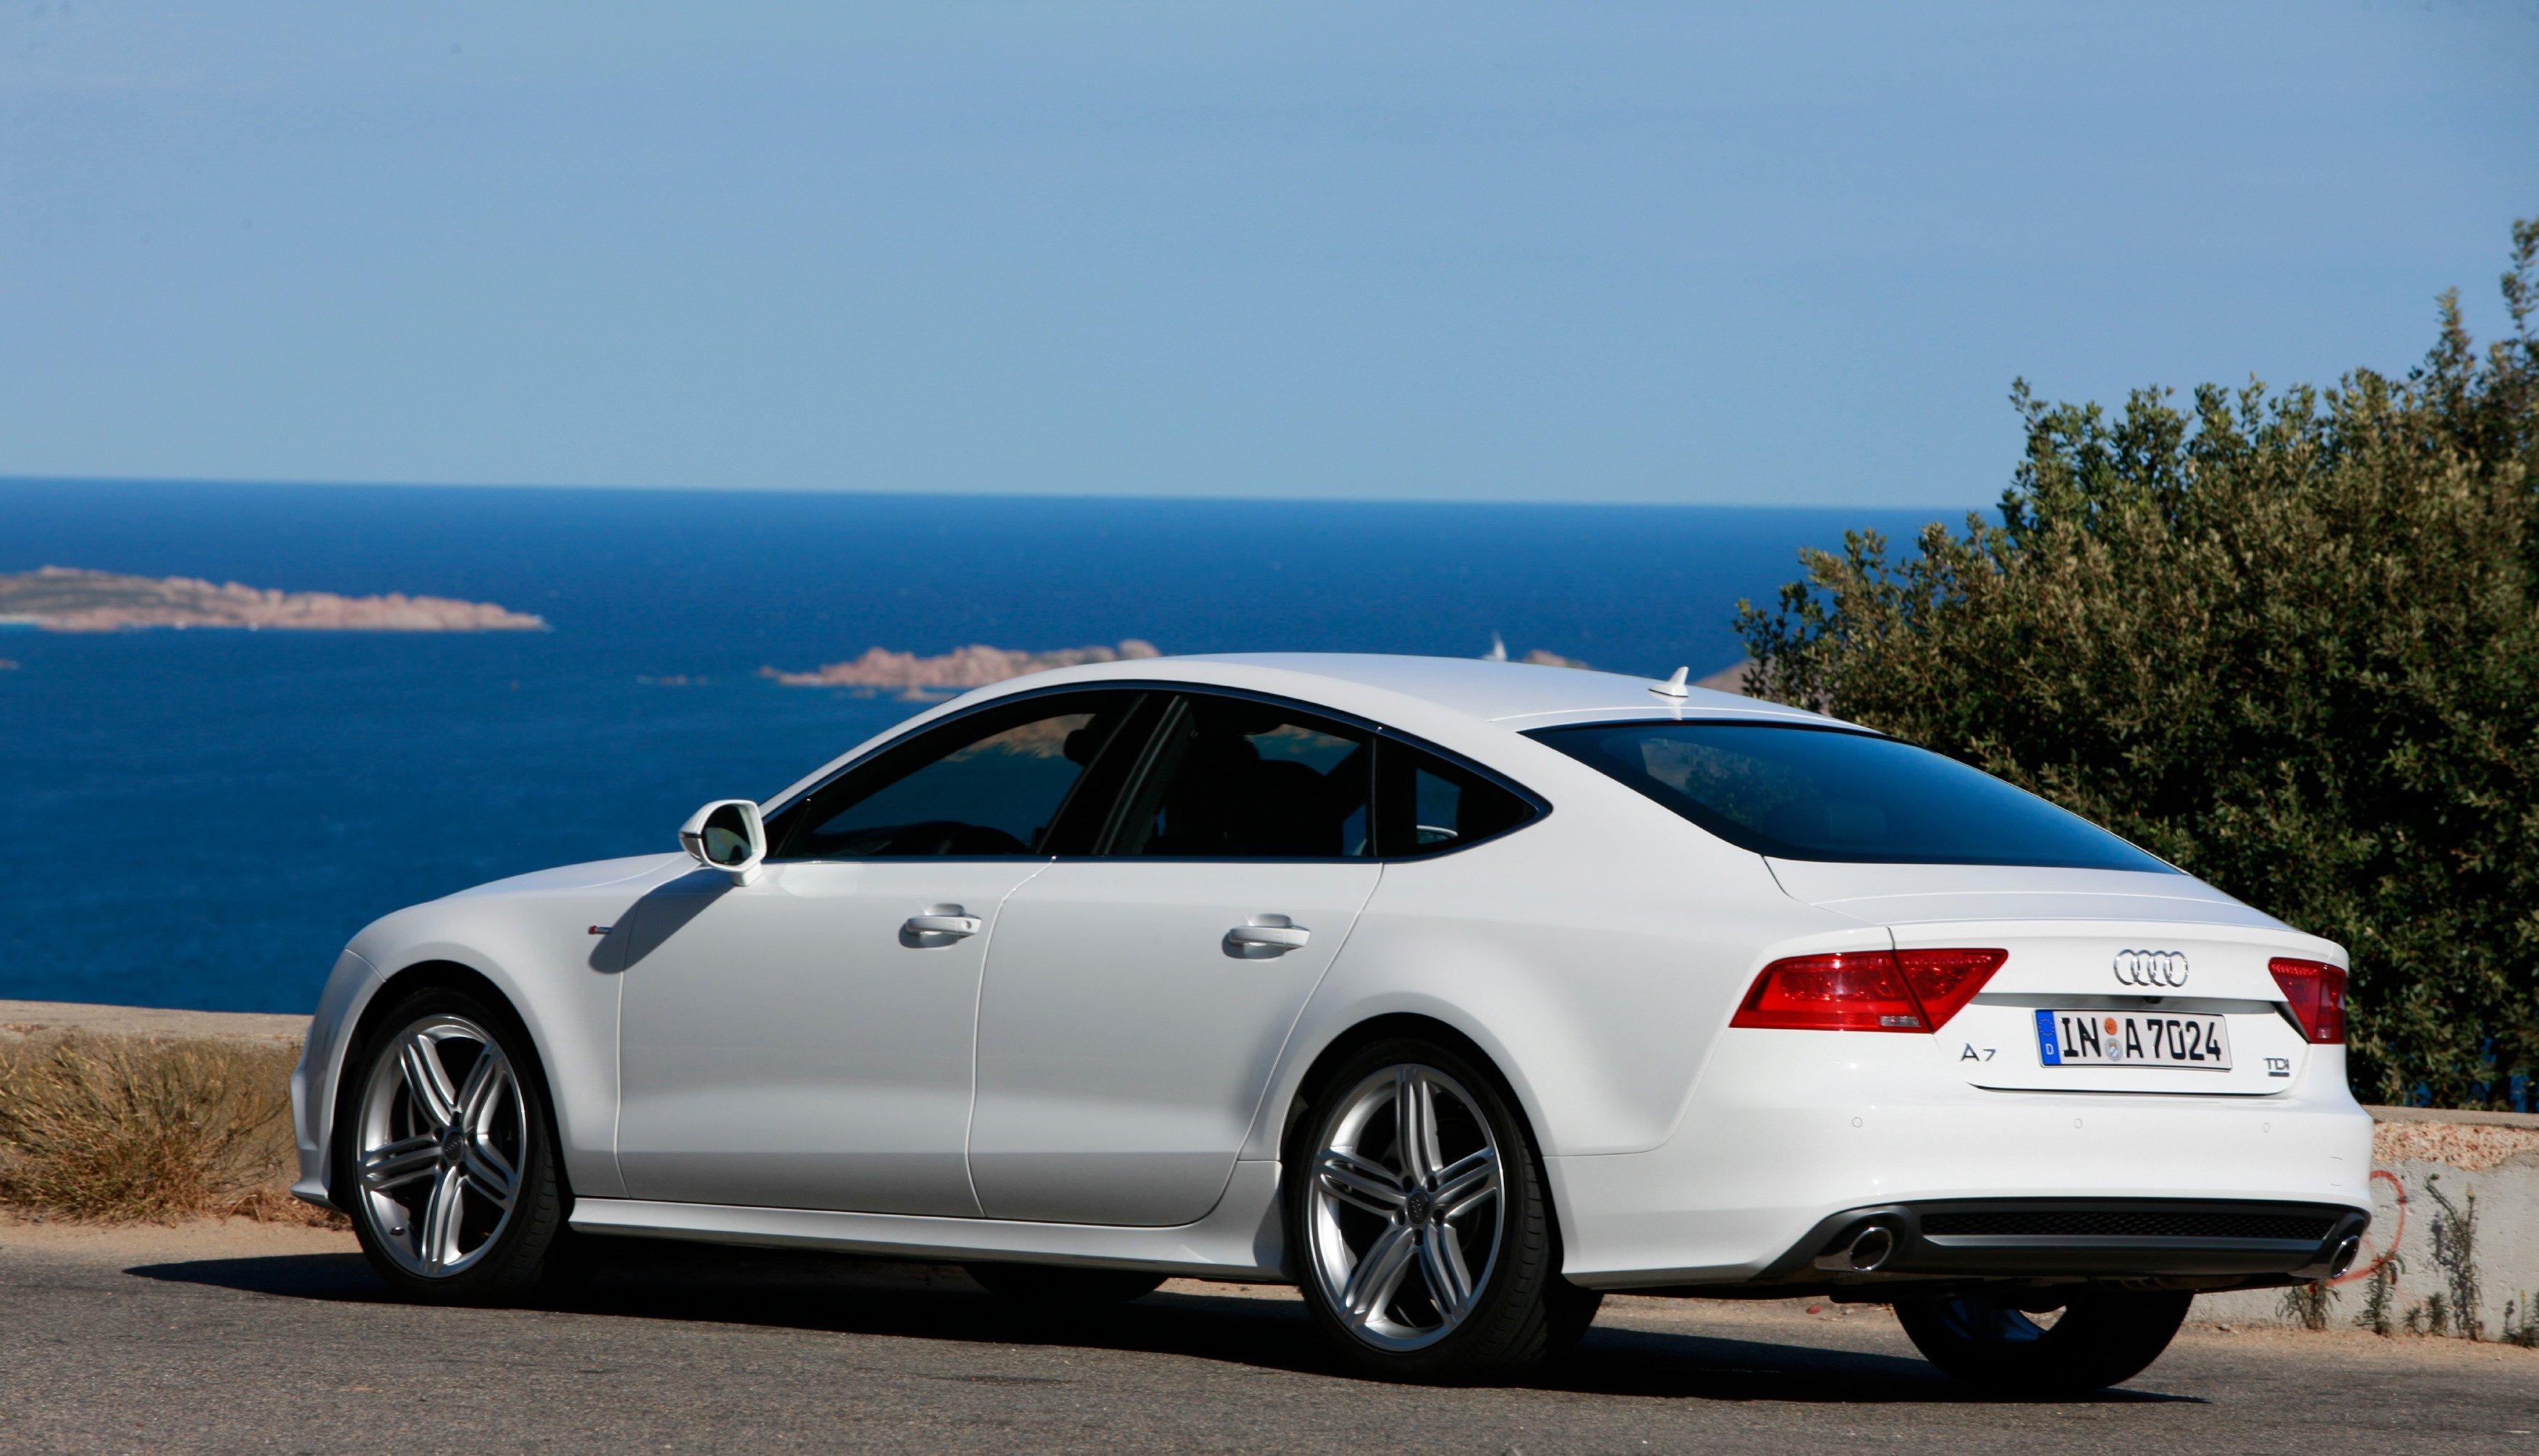 Audi A7  Exterior Rear View